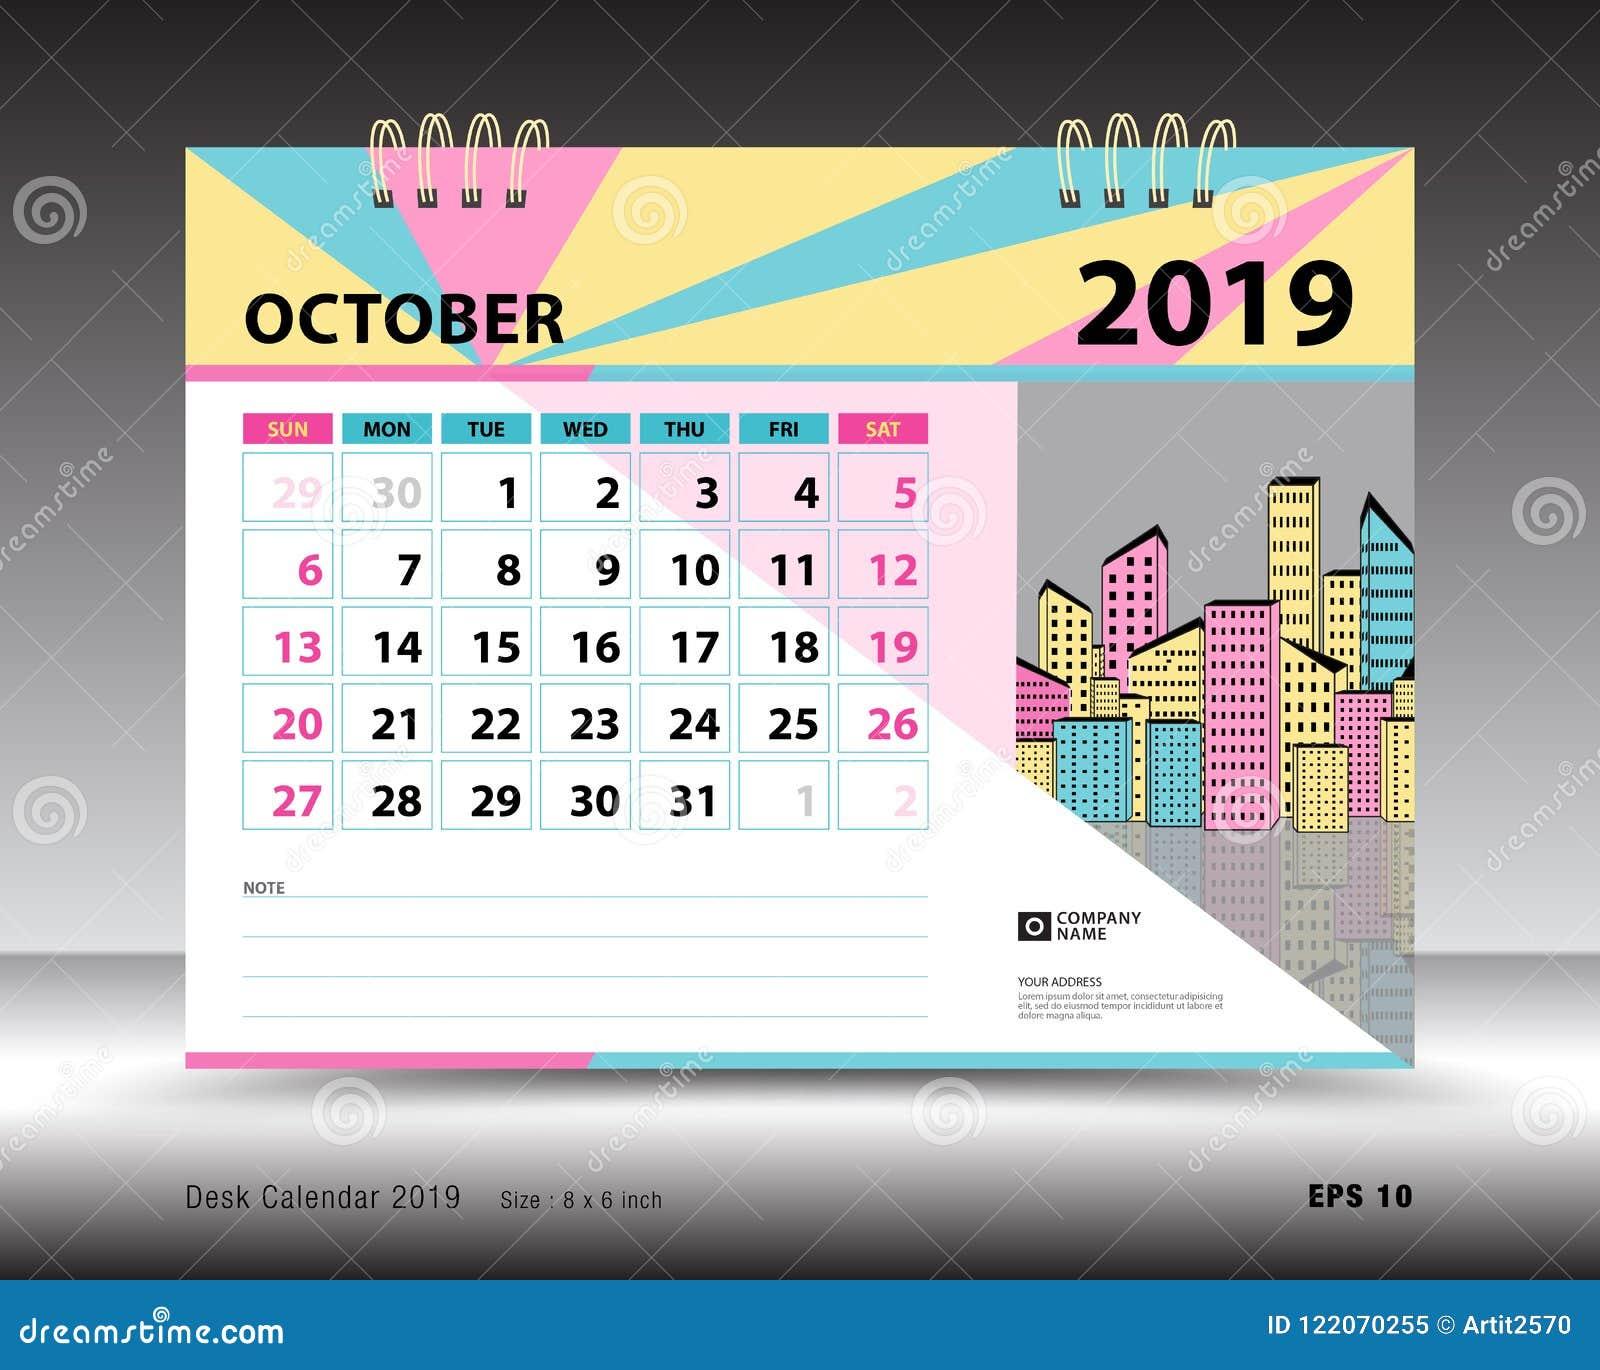 Desk Calendar For October 2019 Template Printable Calendar Planner